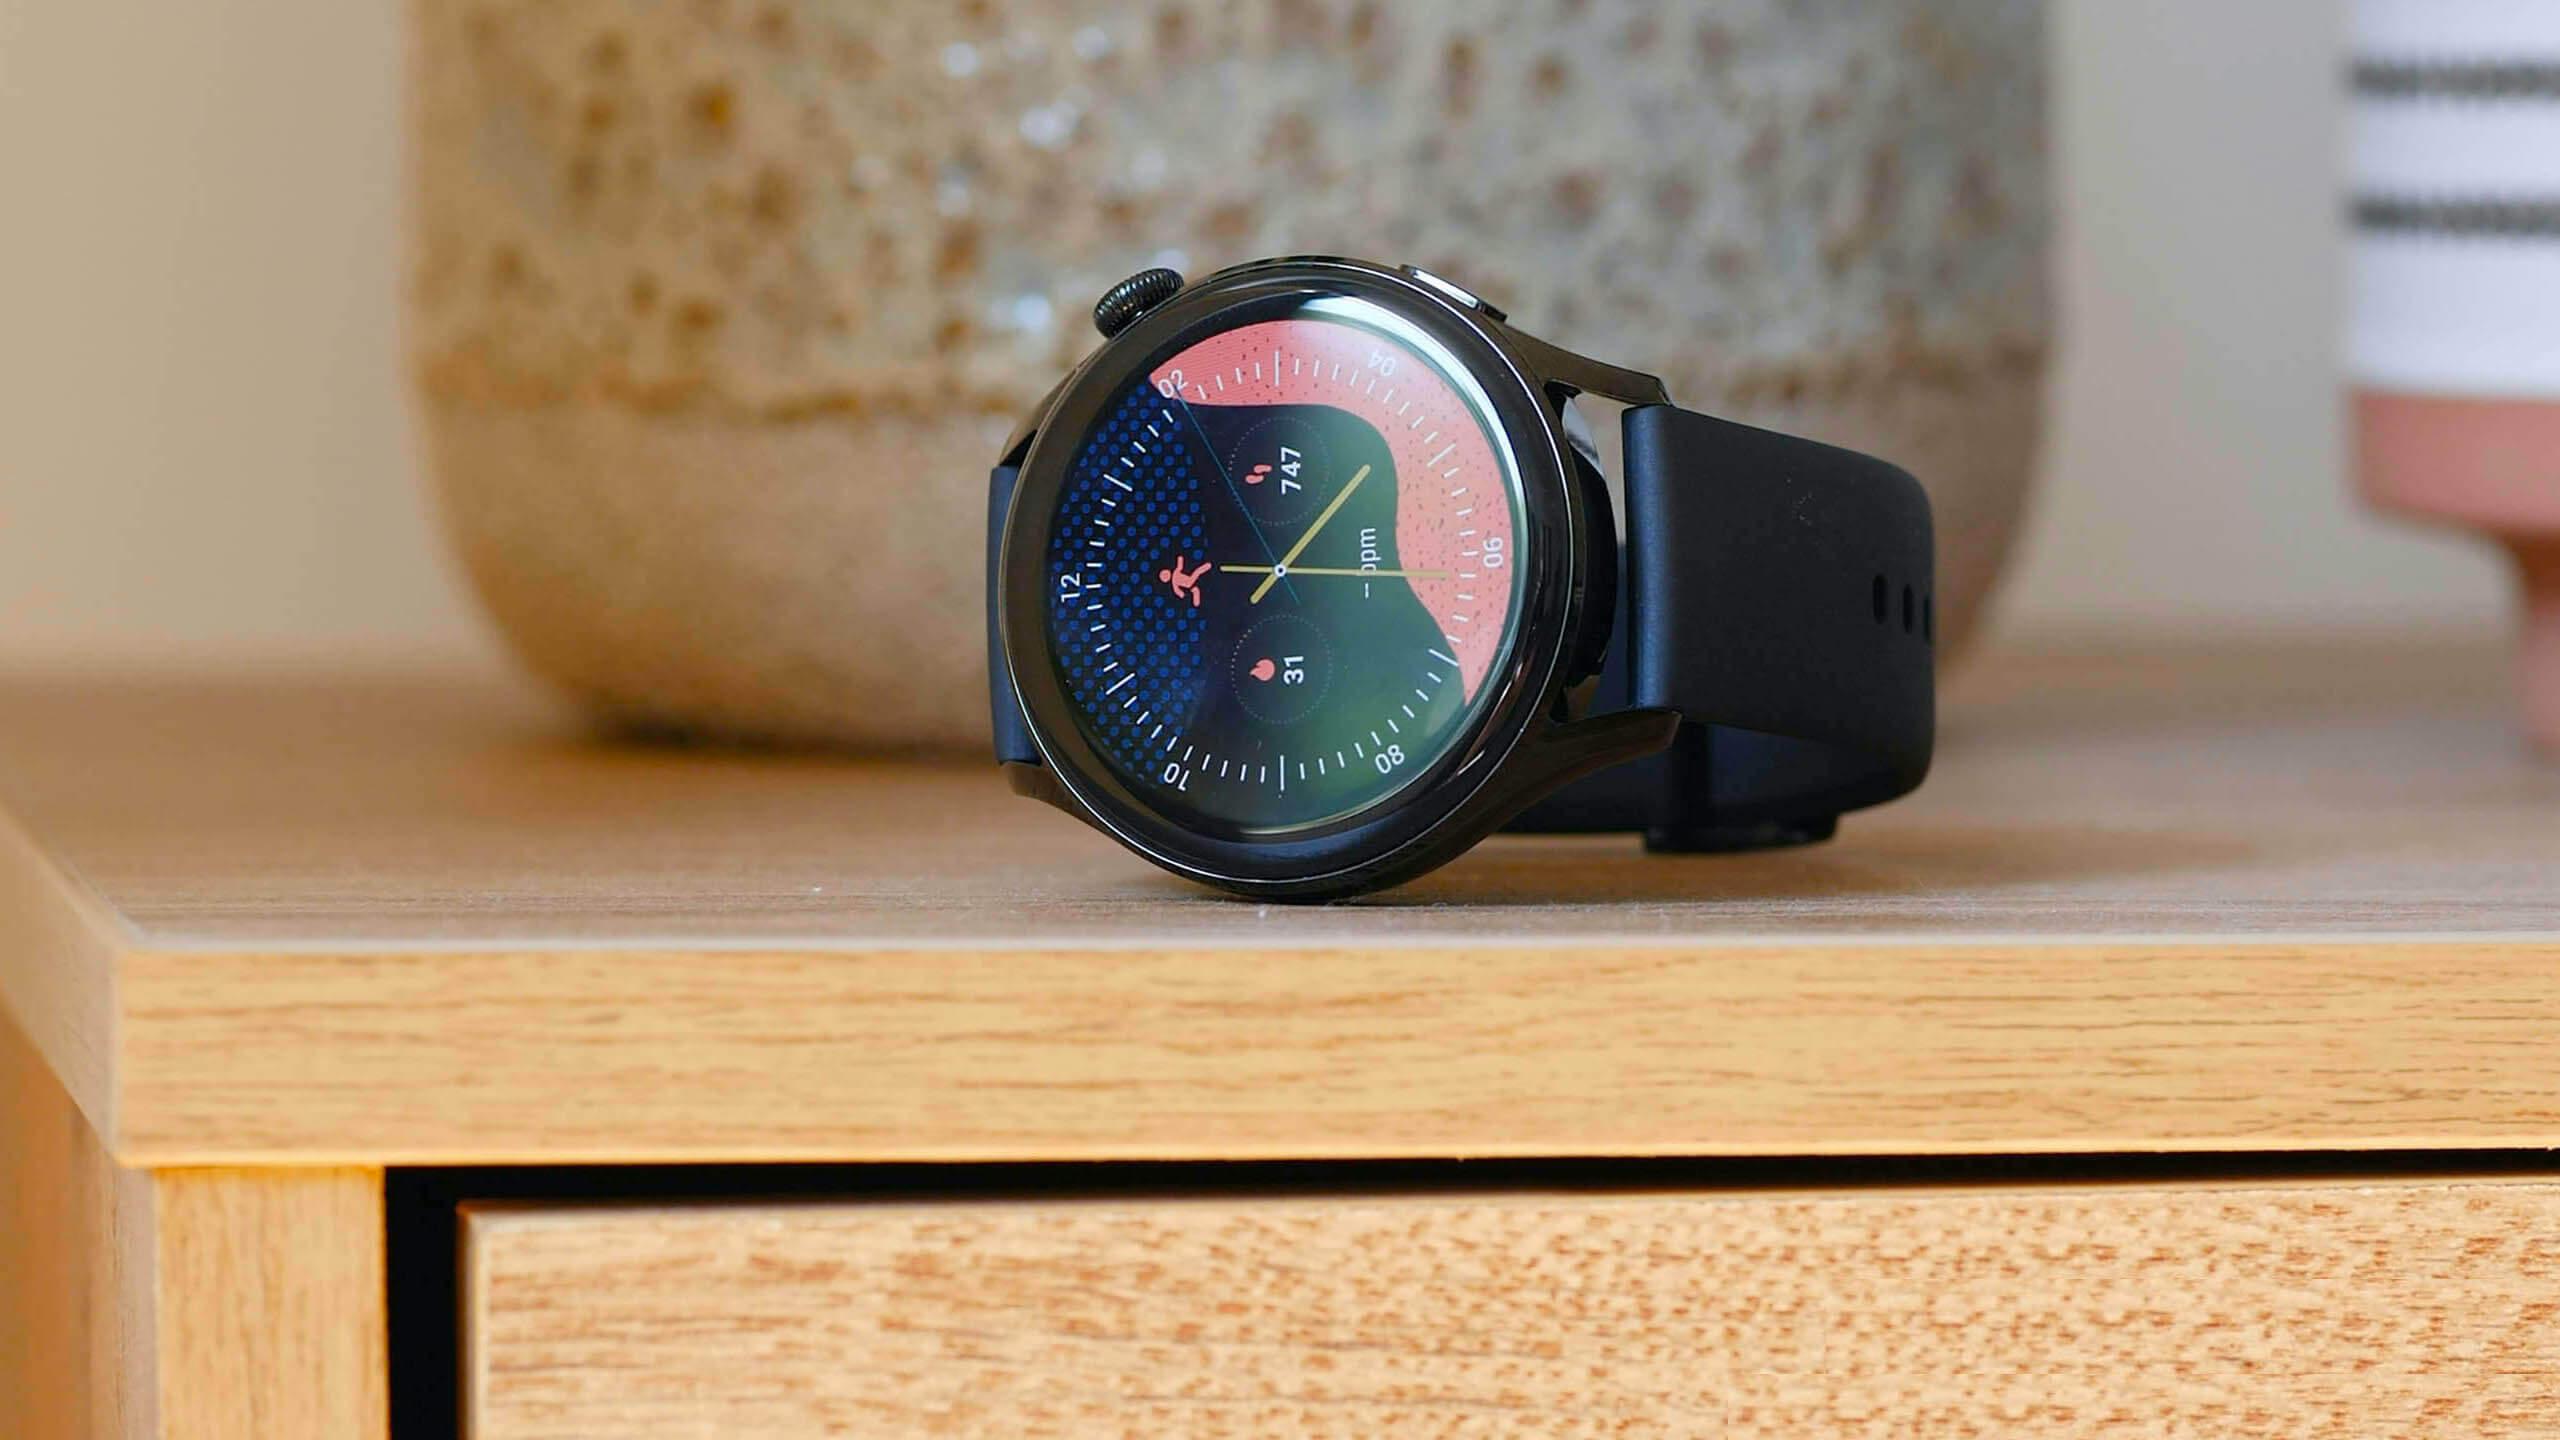 Представлены смарт-часы Huawei Watch 3 и Watch 3 Pro на базе HarmonyOS 2.0